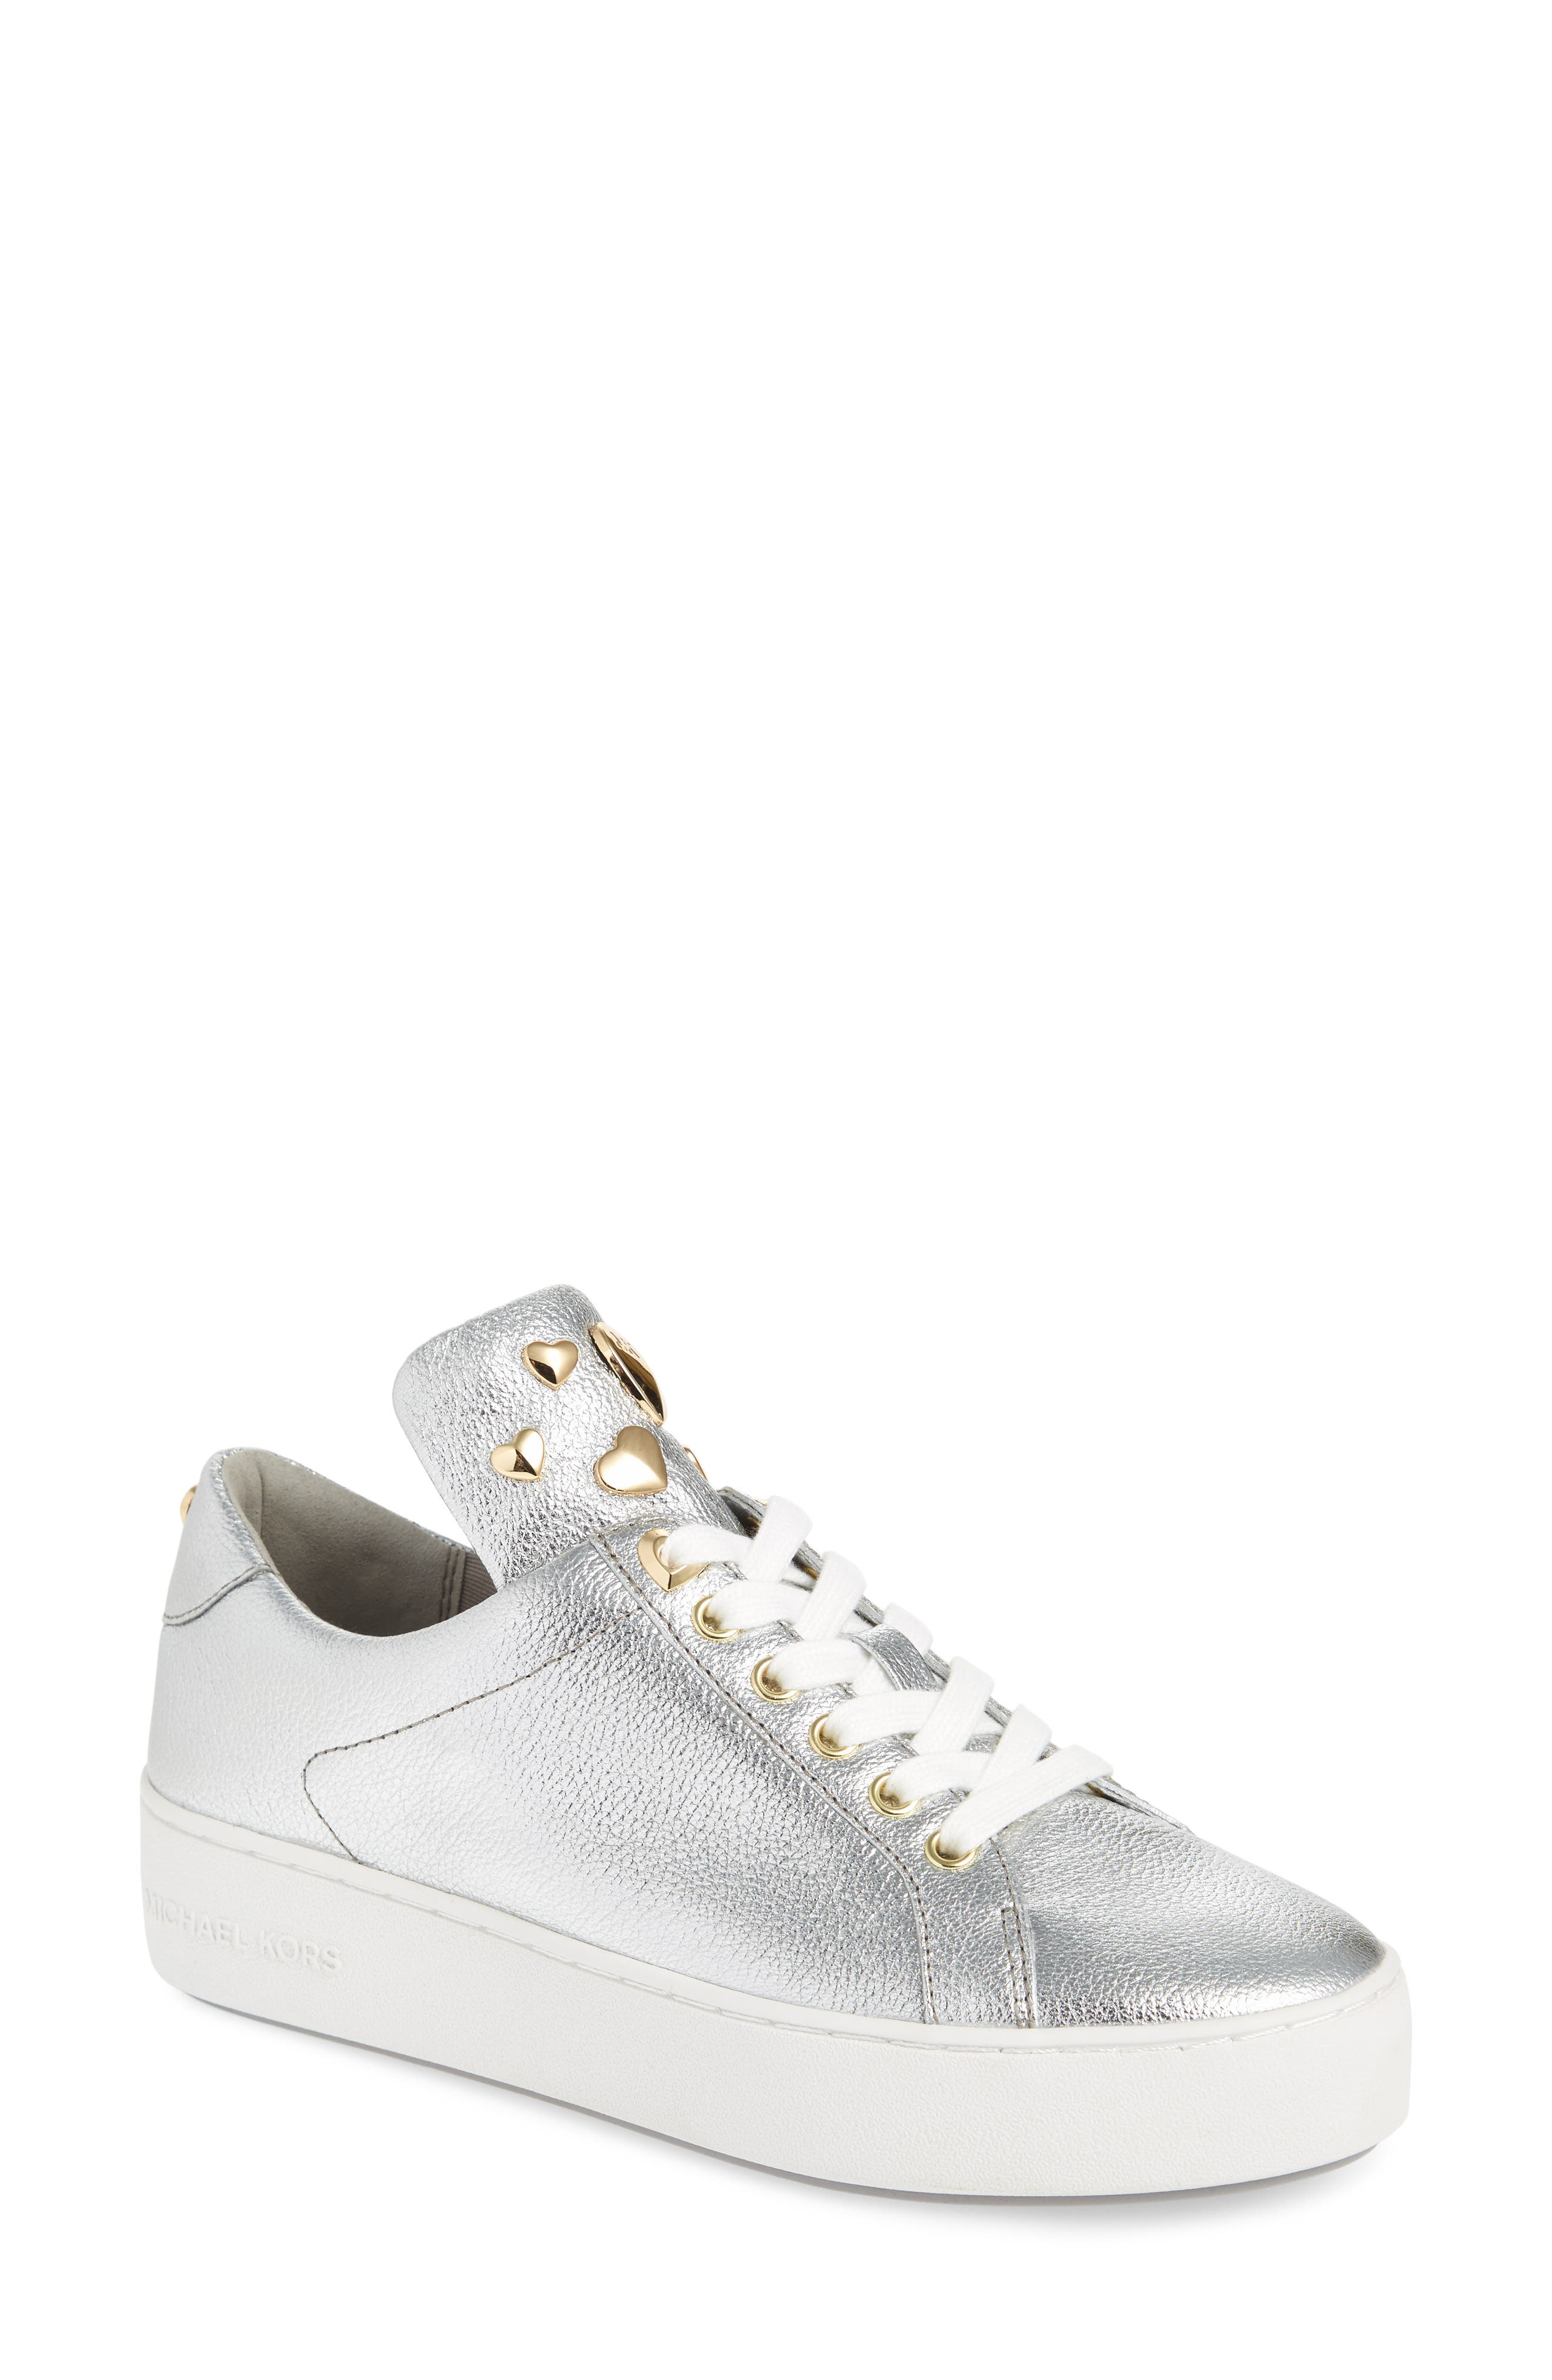 Alternate Image 1 Selected - MICHAEL Michael Kors Mindy Platform Sneaker (Women)